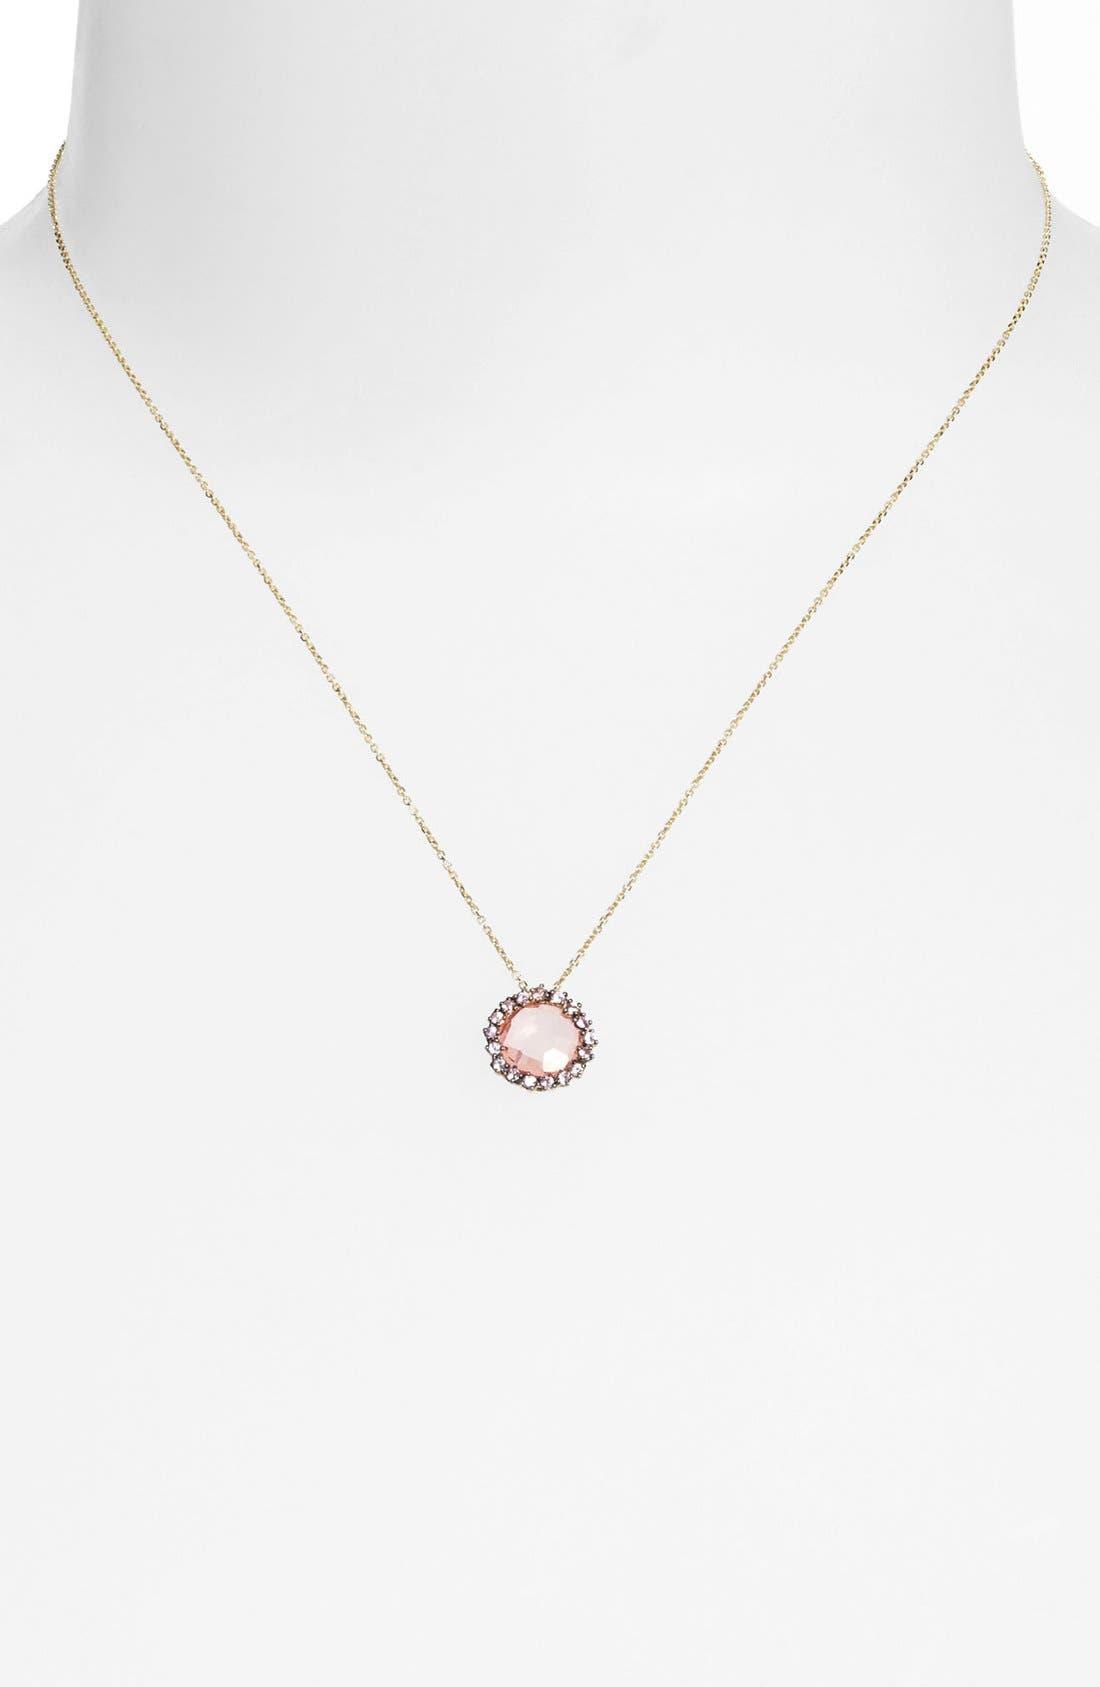 Alternate Image 1 Selected - KALAN by Suzanne Kalan Round Stone Pendant Necklace